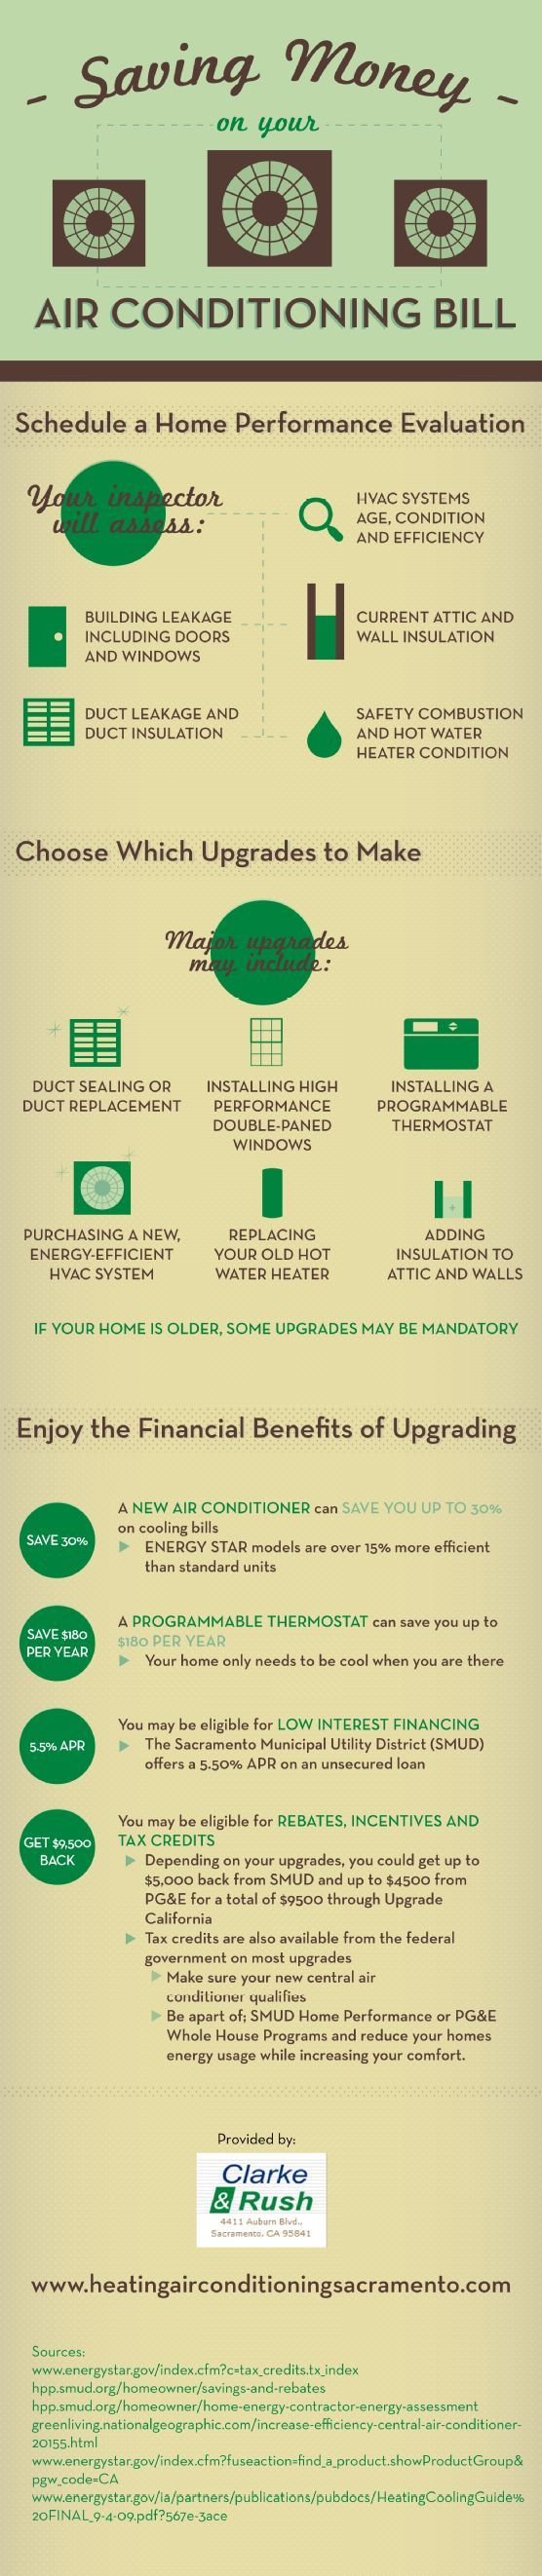 Saving Money on Your Air Conditioning Bill Energy saving